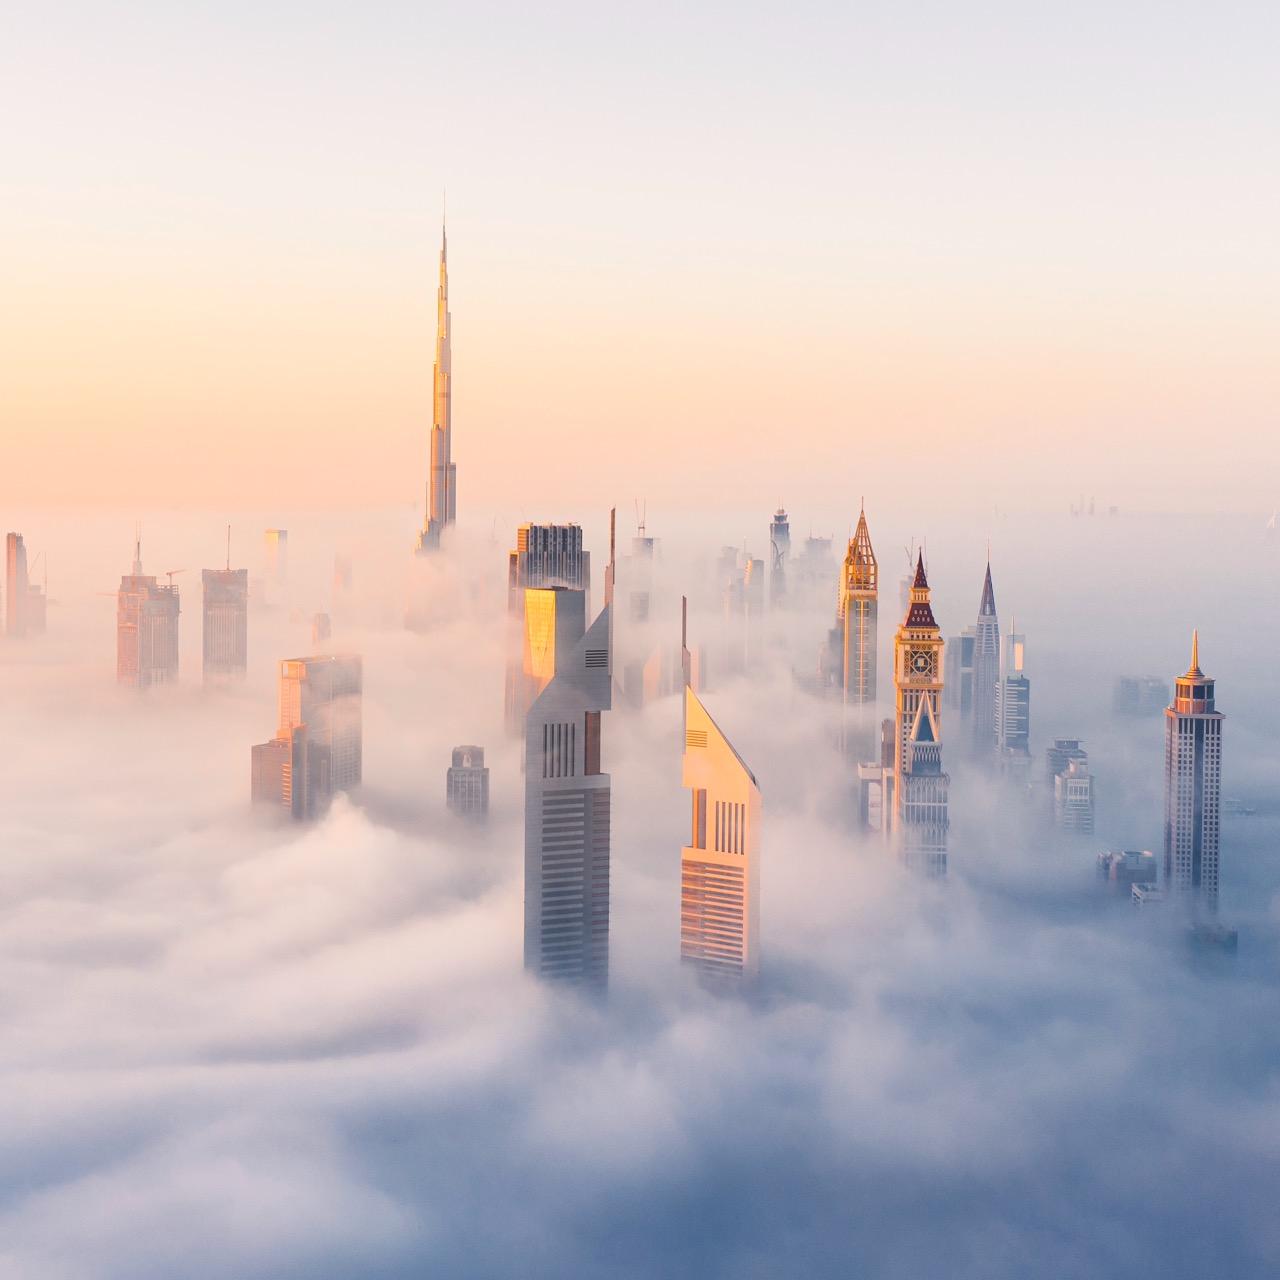 Hugo Healy City In The Sky